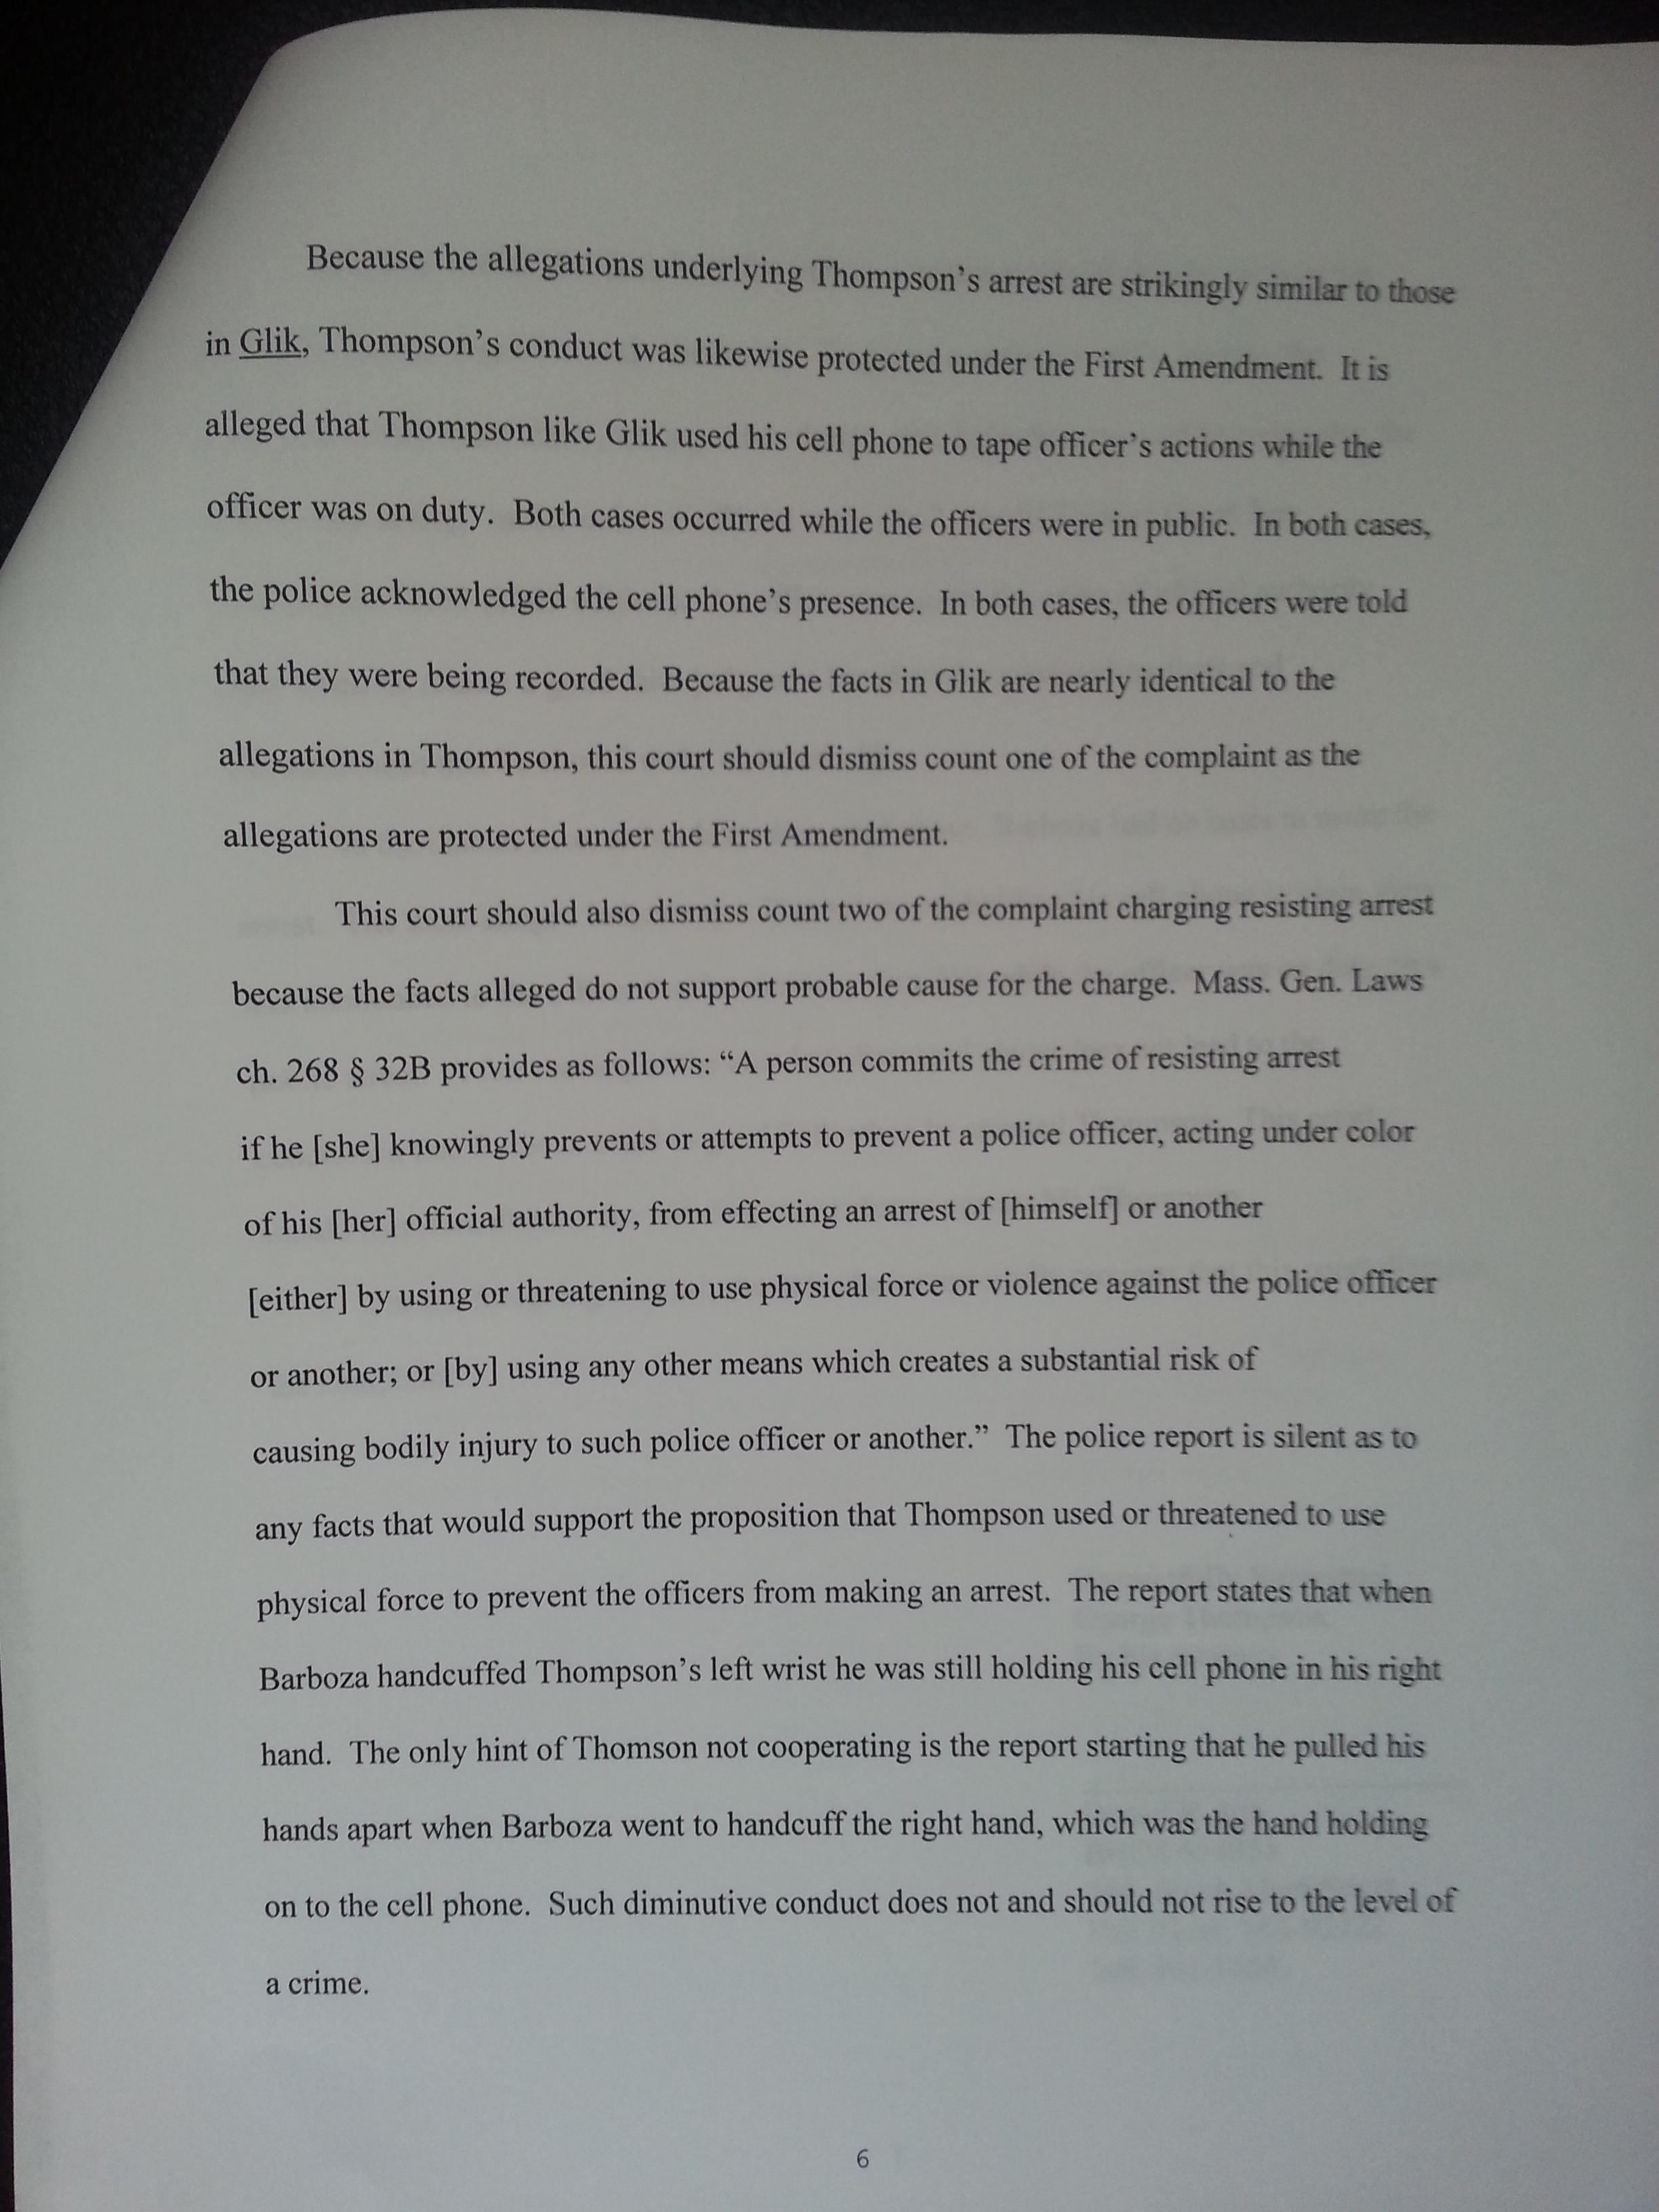 thompson_motion_to_dismiss_p6